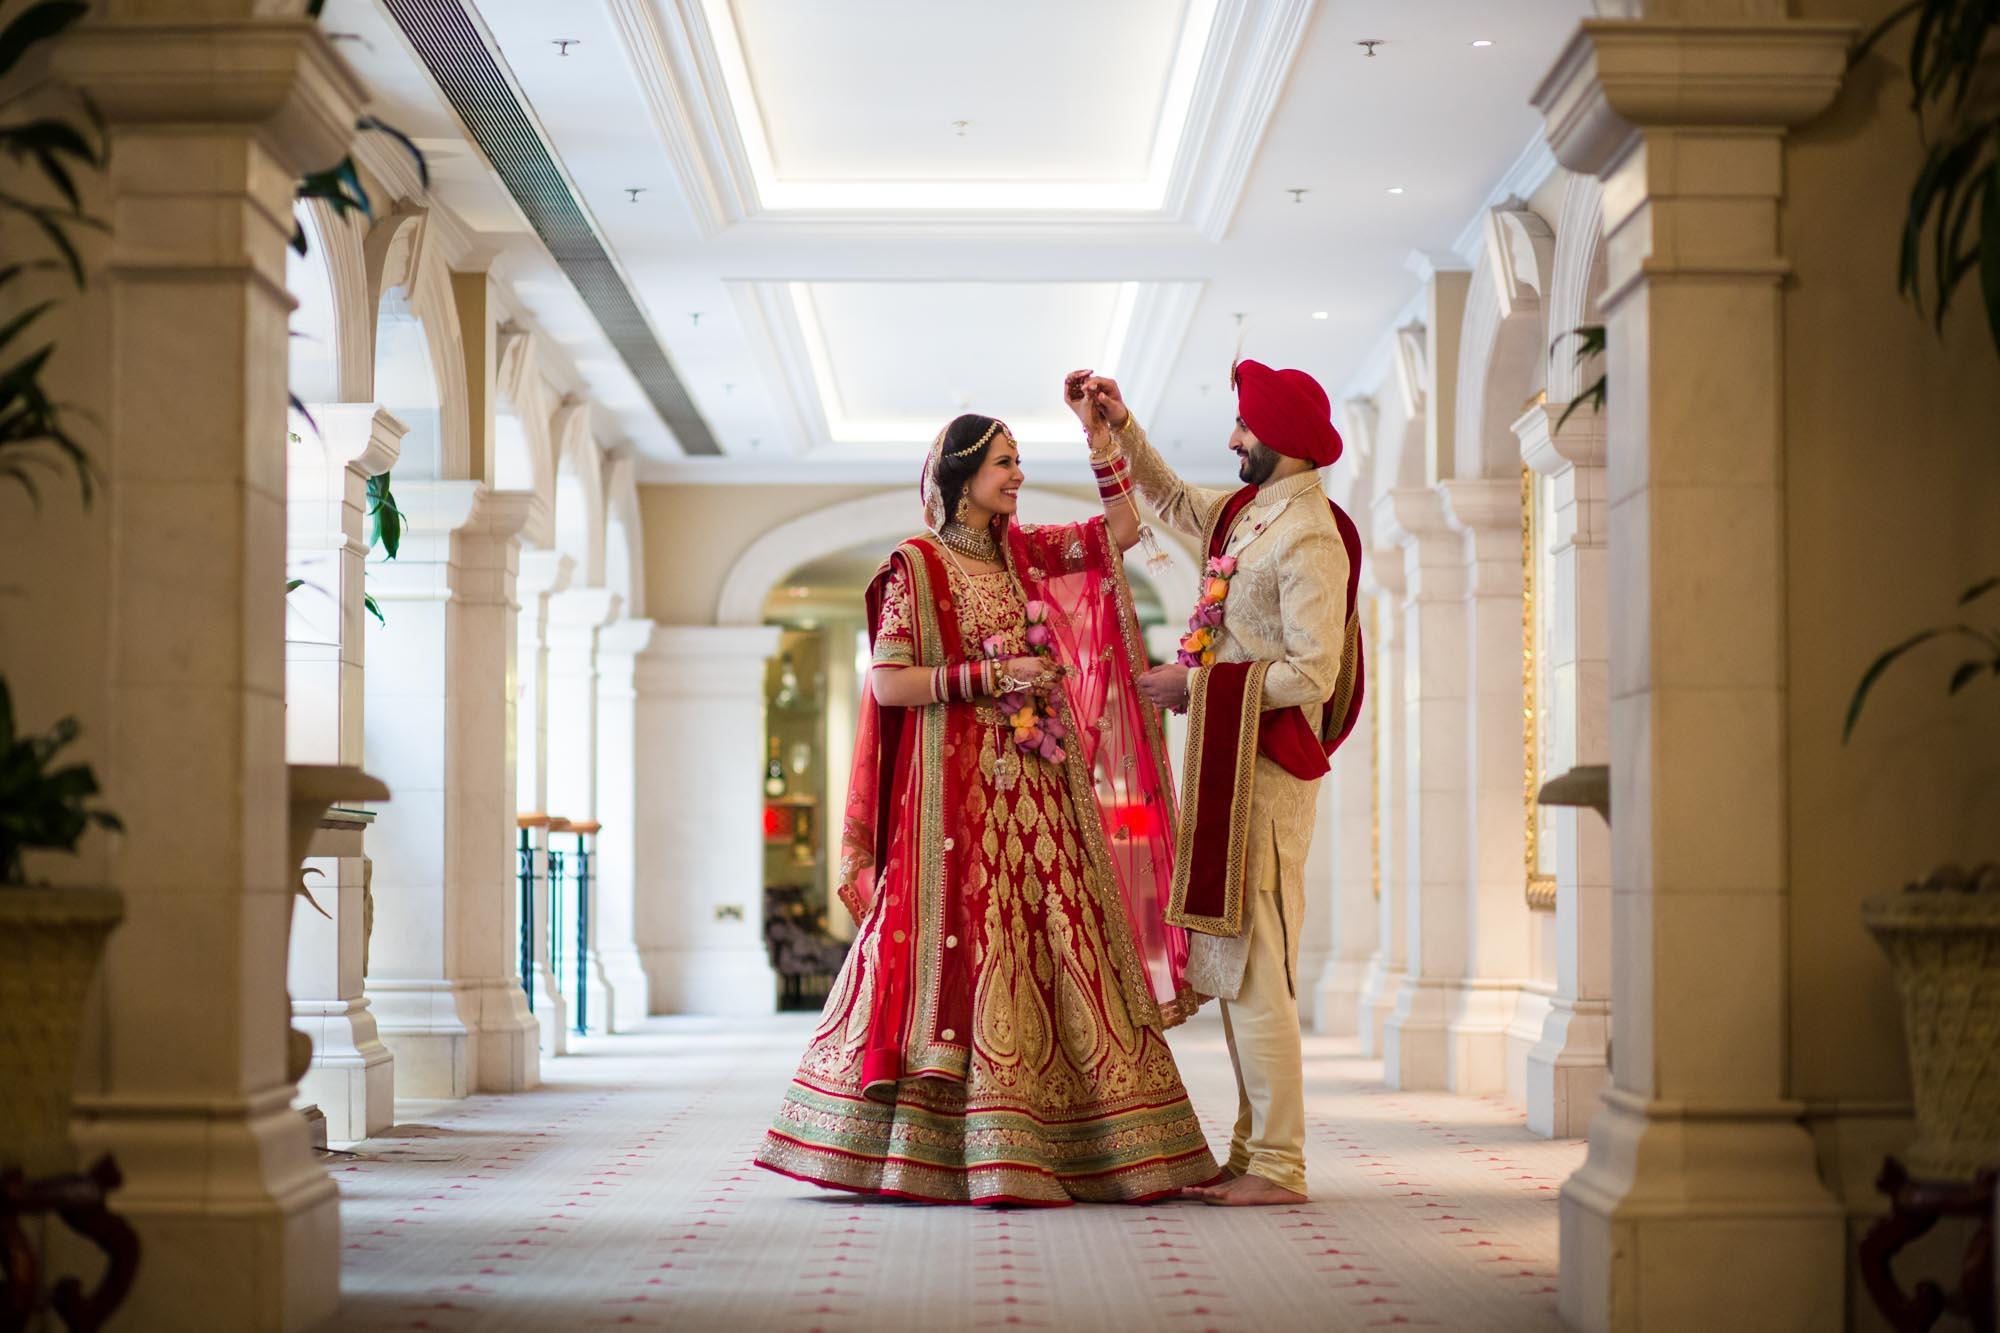 Sikh wedding photographer, The Landmark London